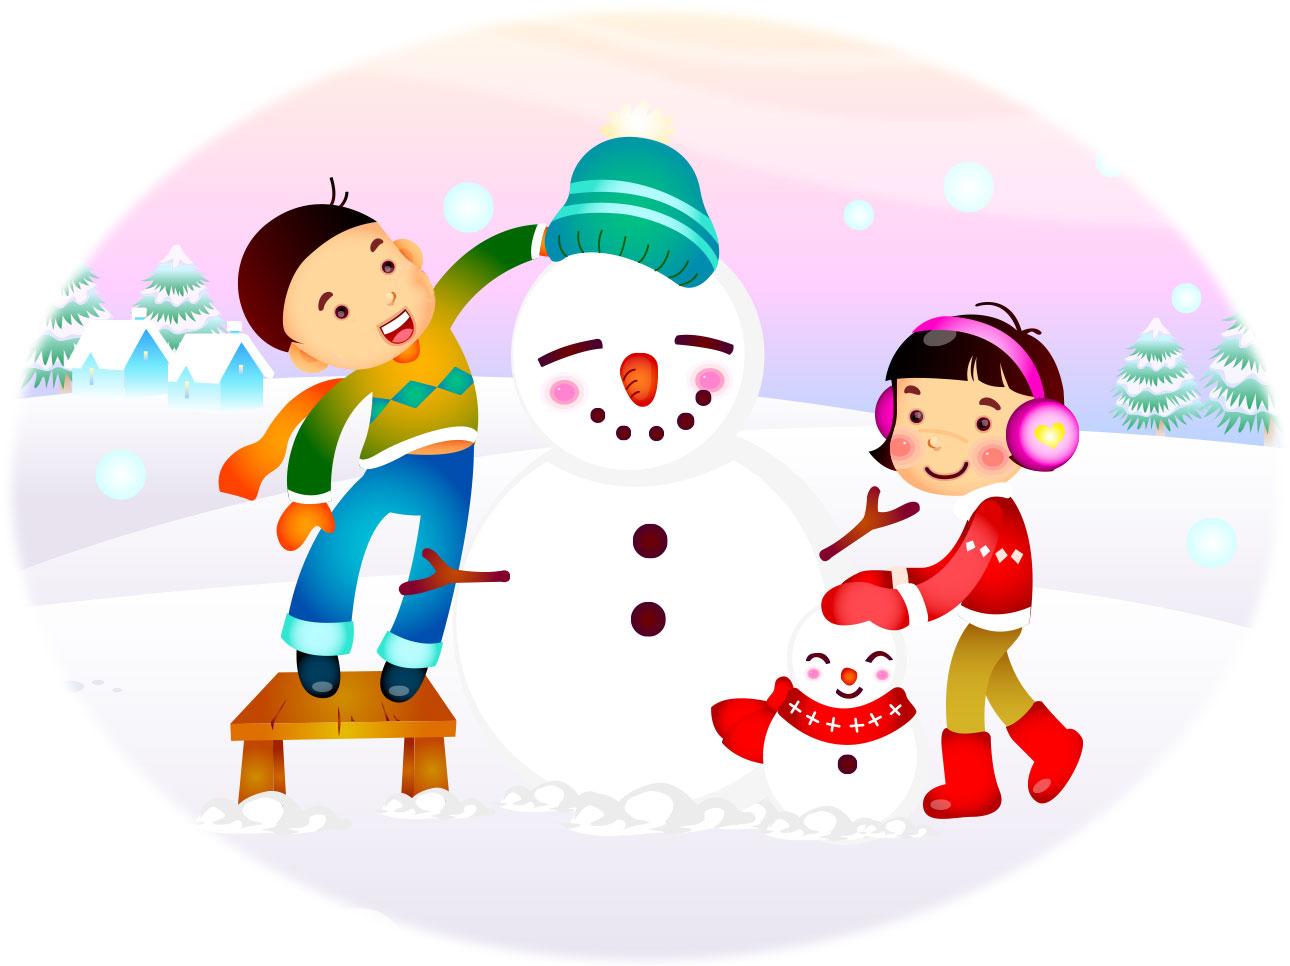 no.305「雪だるまを作る子供たち」 : 【フリー素材】高品質な